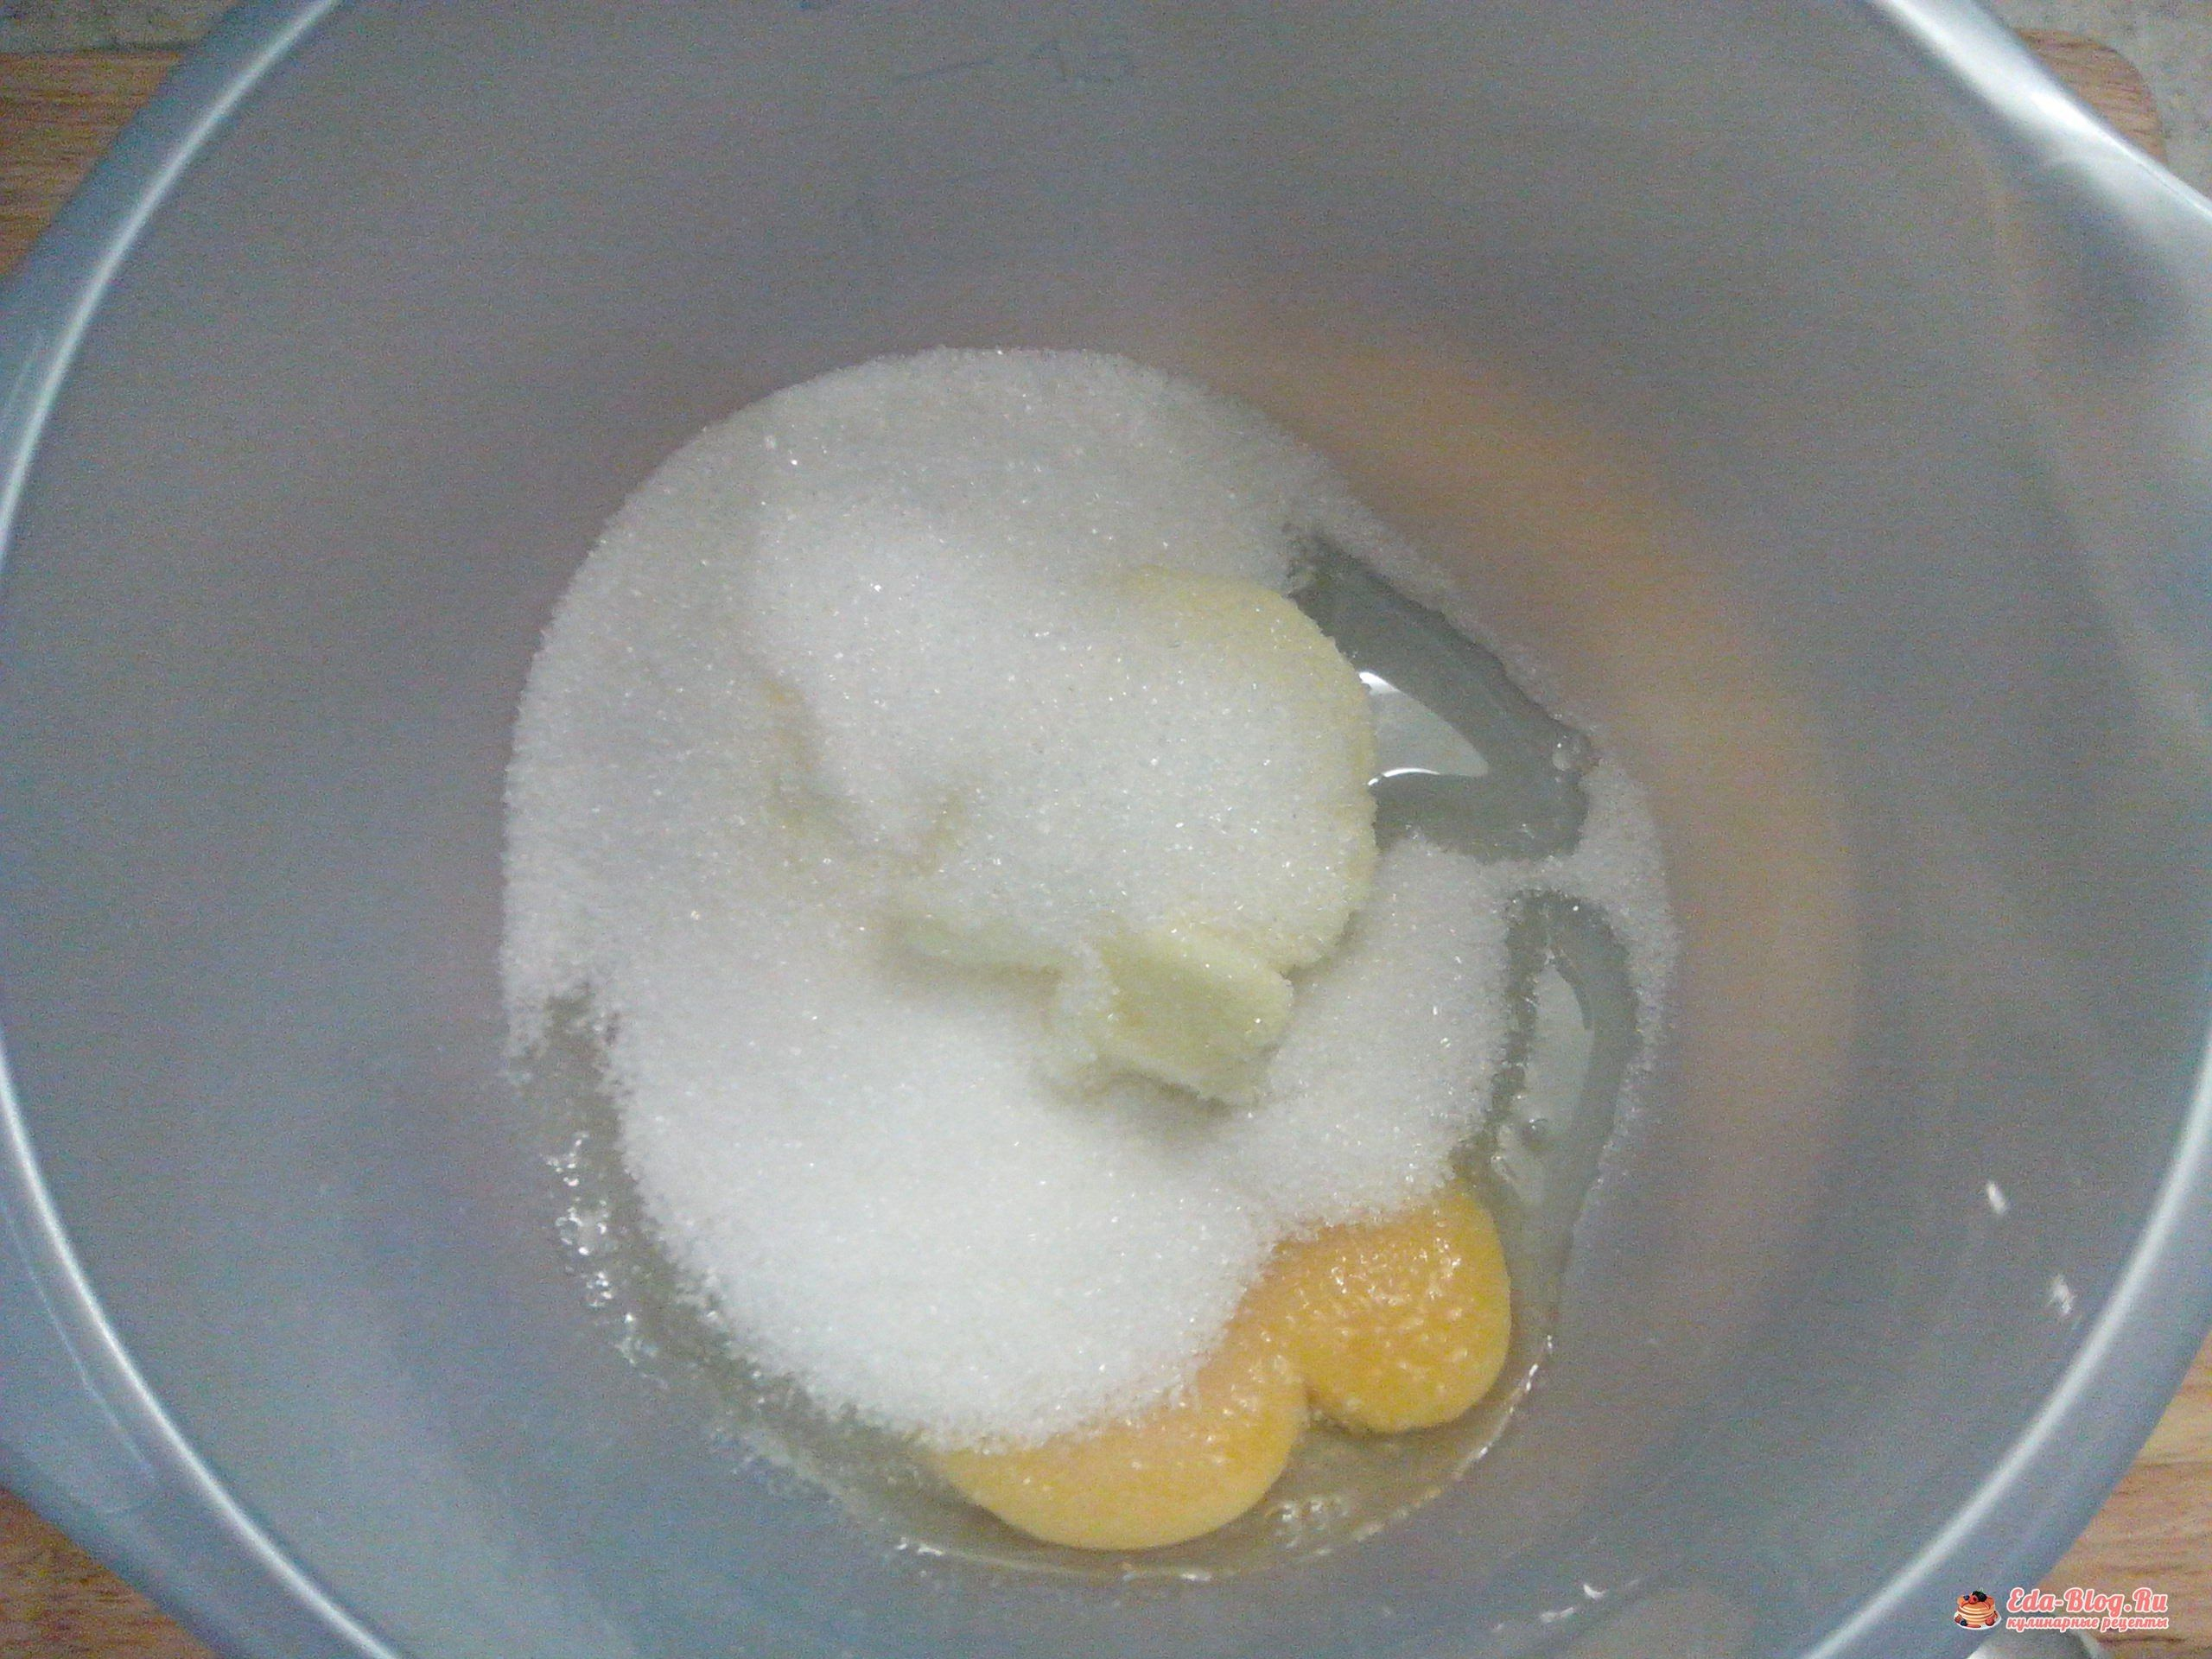 смешиваем яйцо, масло и сахар